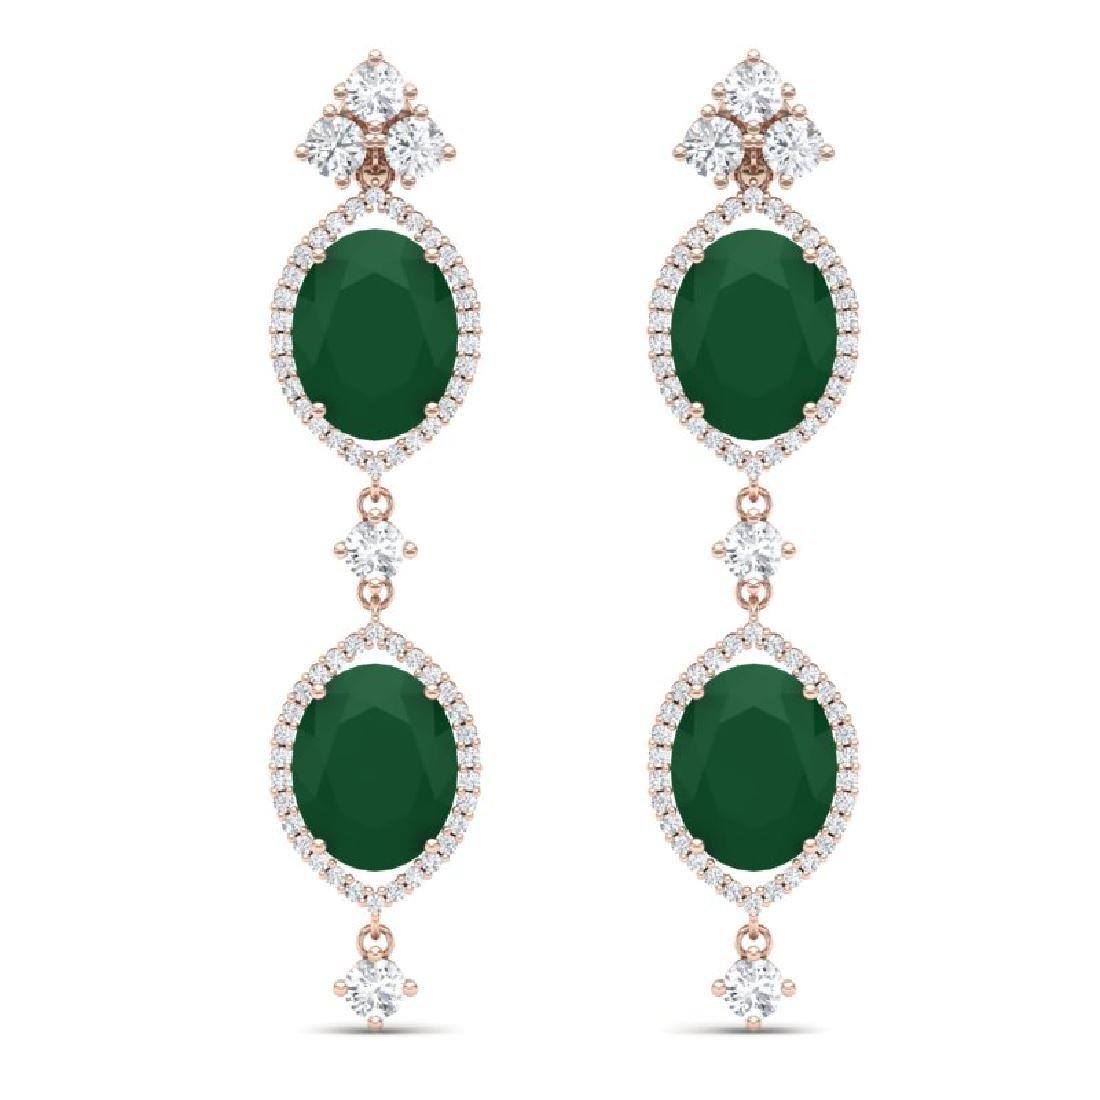 15.81 CTW Royalty Emerald & VS Diamond Earrings 18K